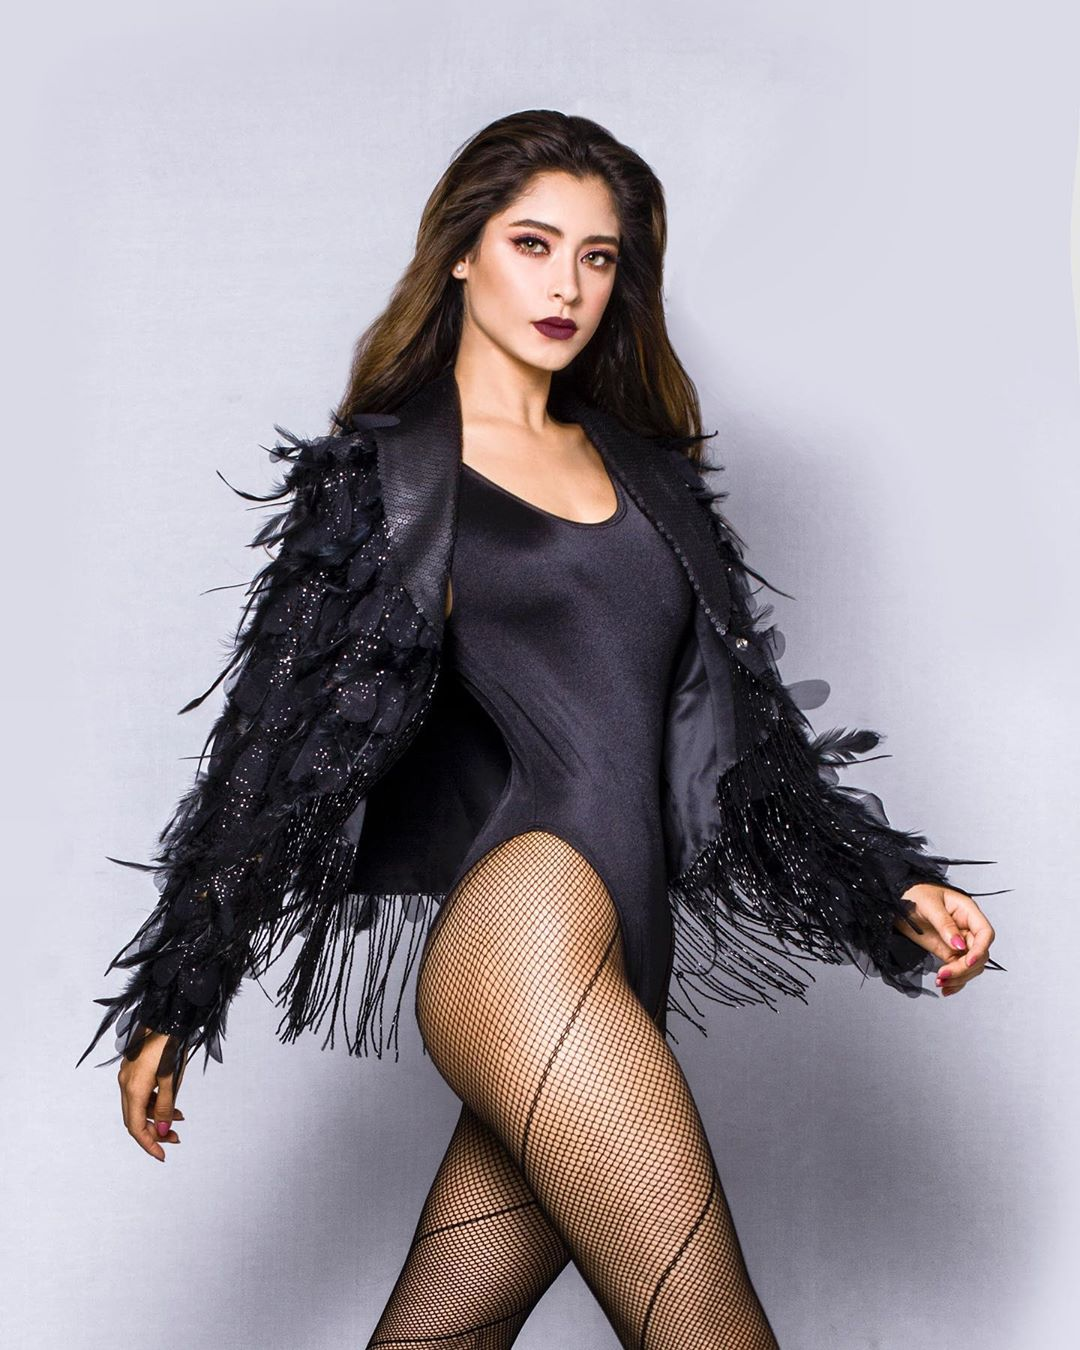 angela leon yuriar, miss grand mexico 2020. - Página 3 66521310